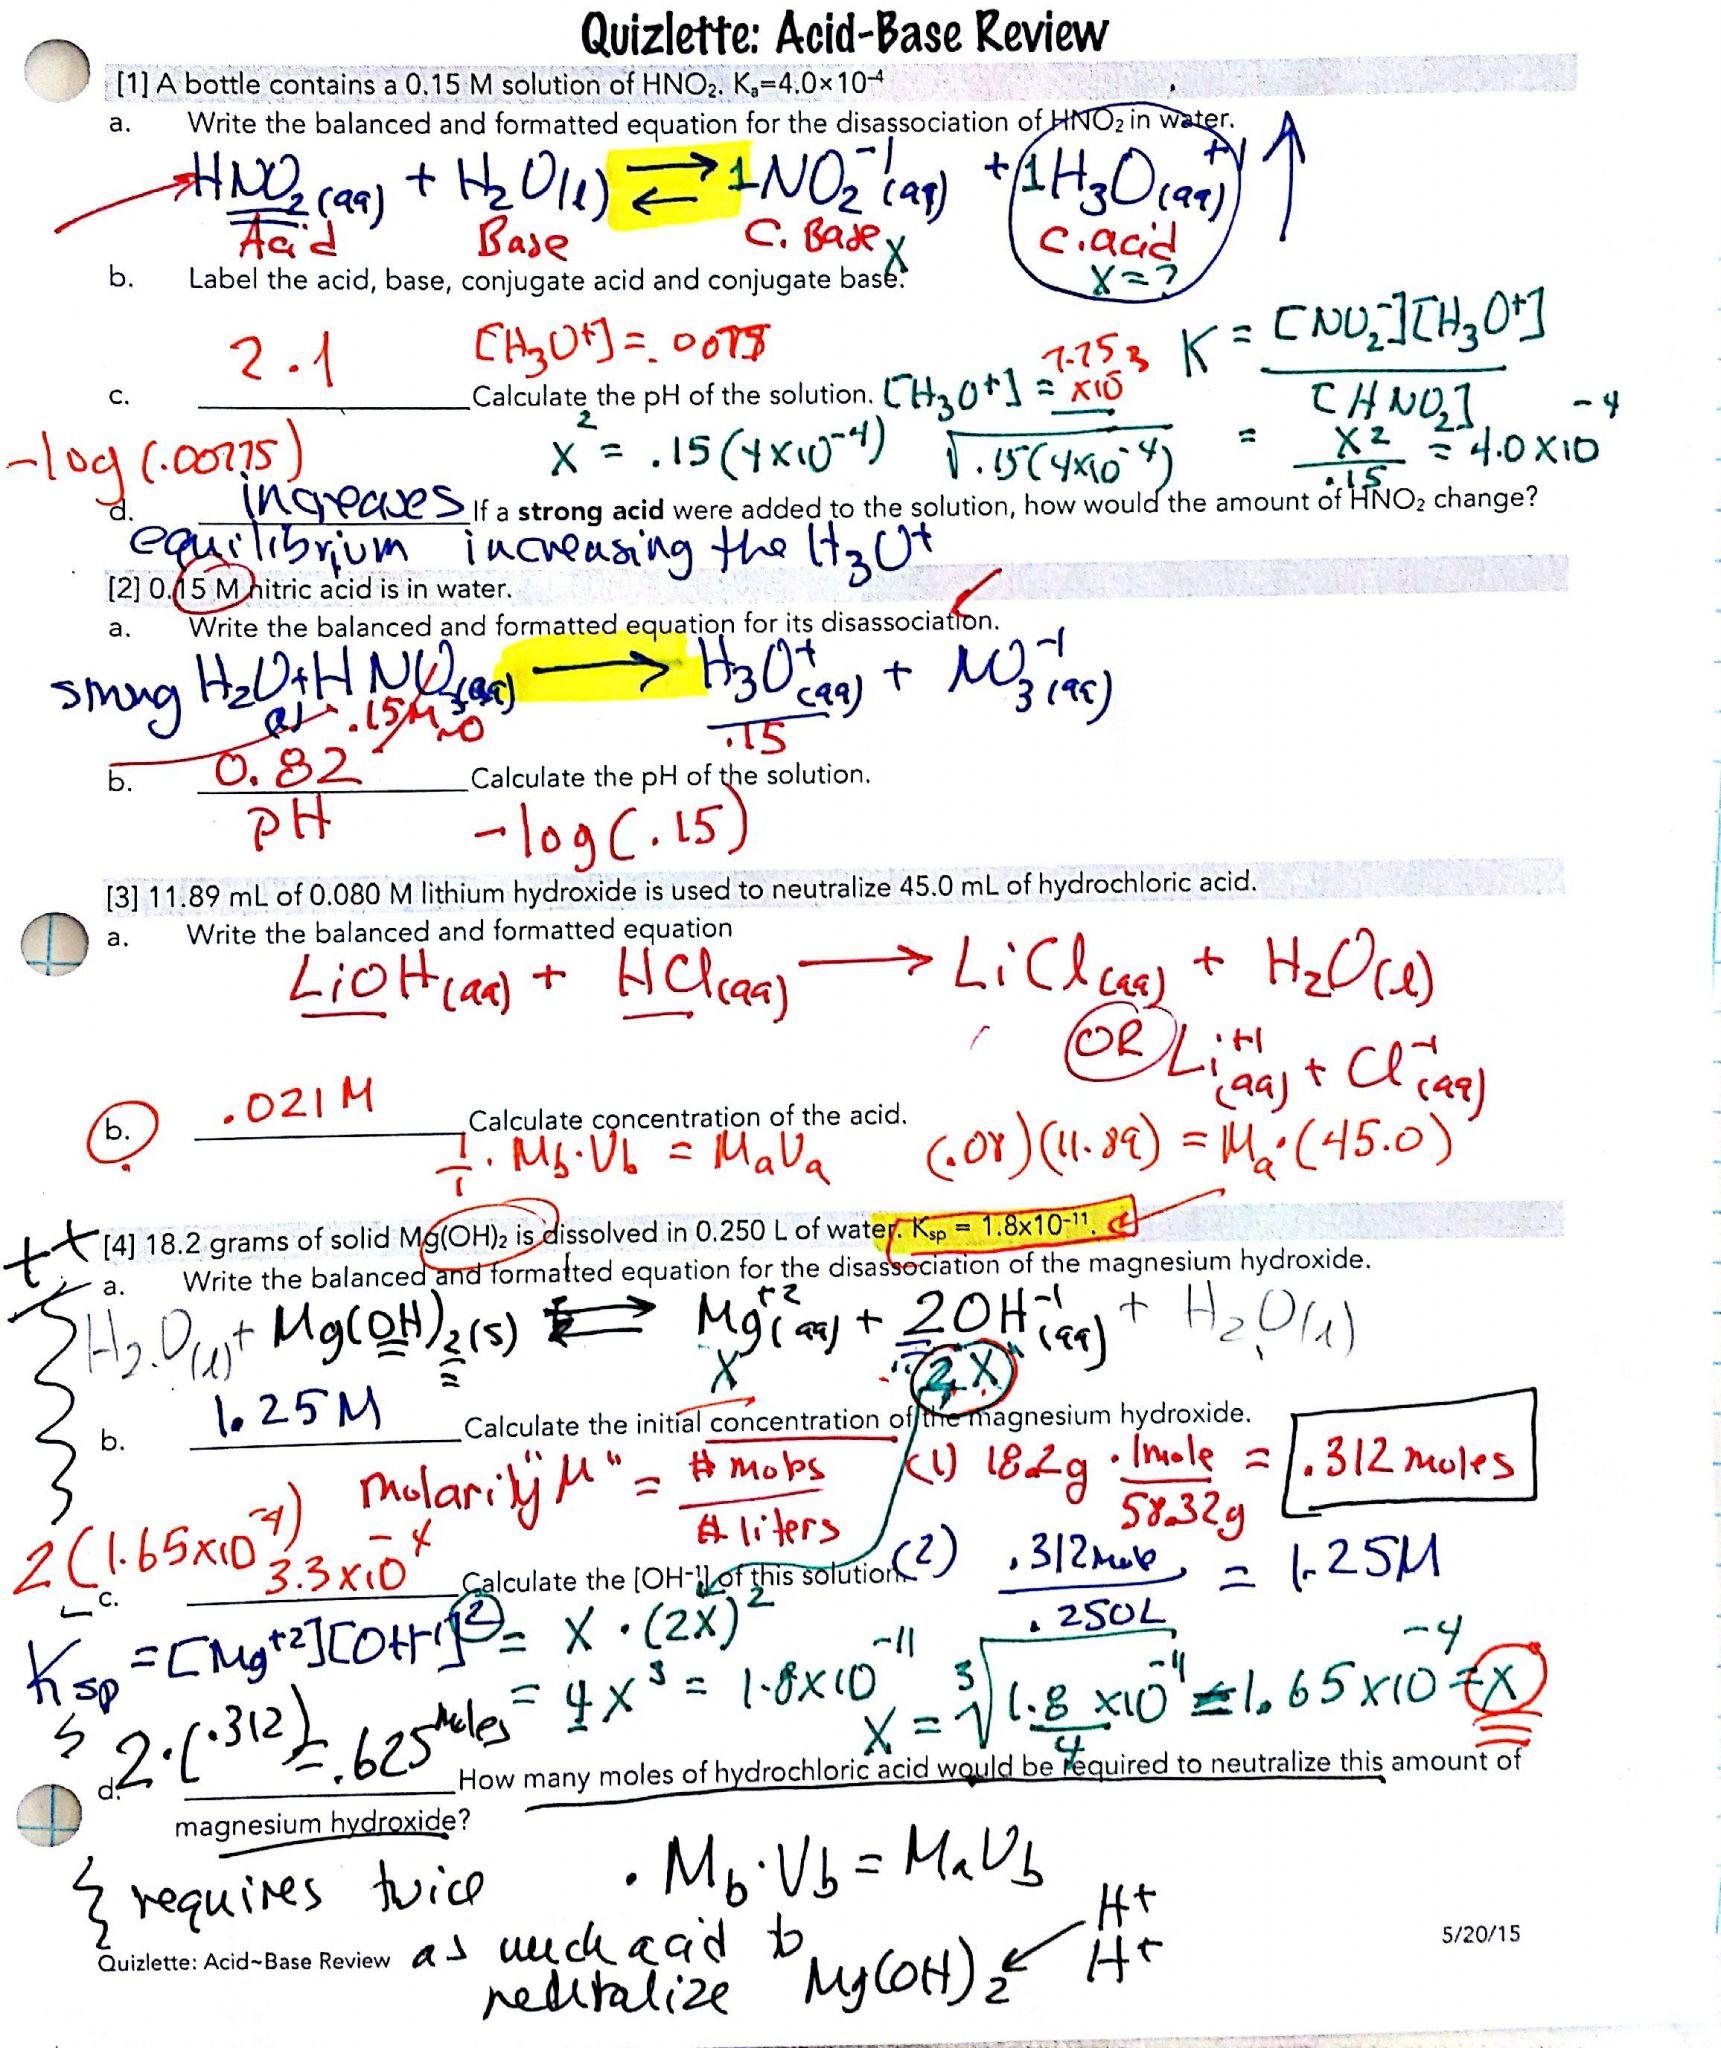 Average Atomic Mass Worksheet Show All Work Answer Key